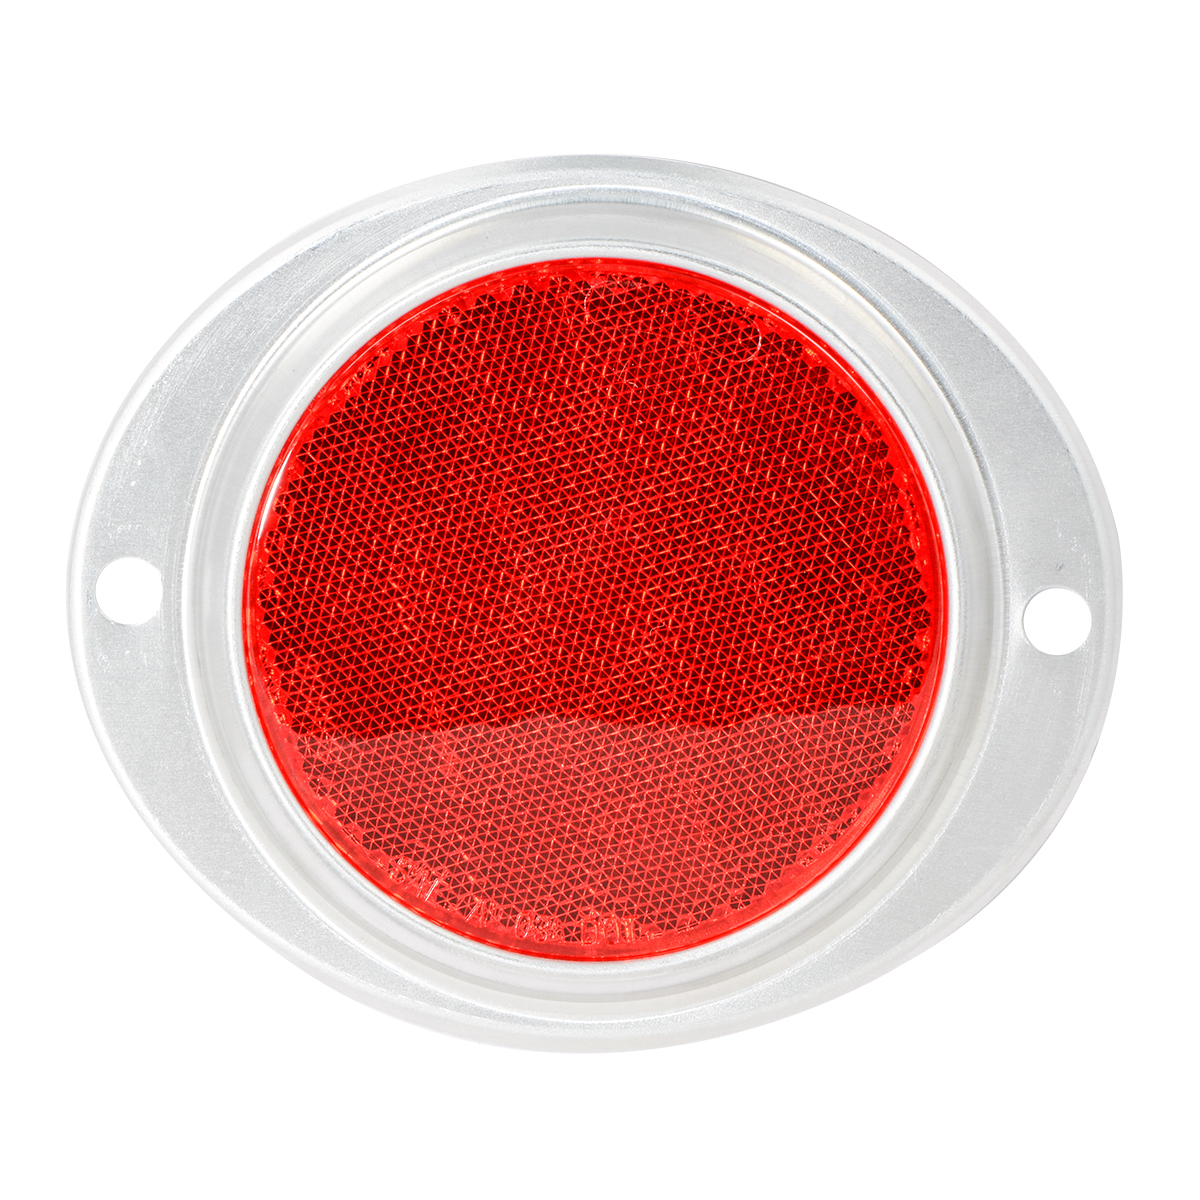 "80816 Red 3"" Round Reflector w/ Aluminum 2 Hole Screw Mount Base"